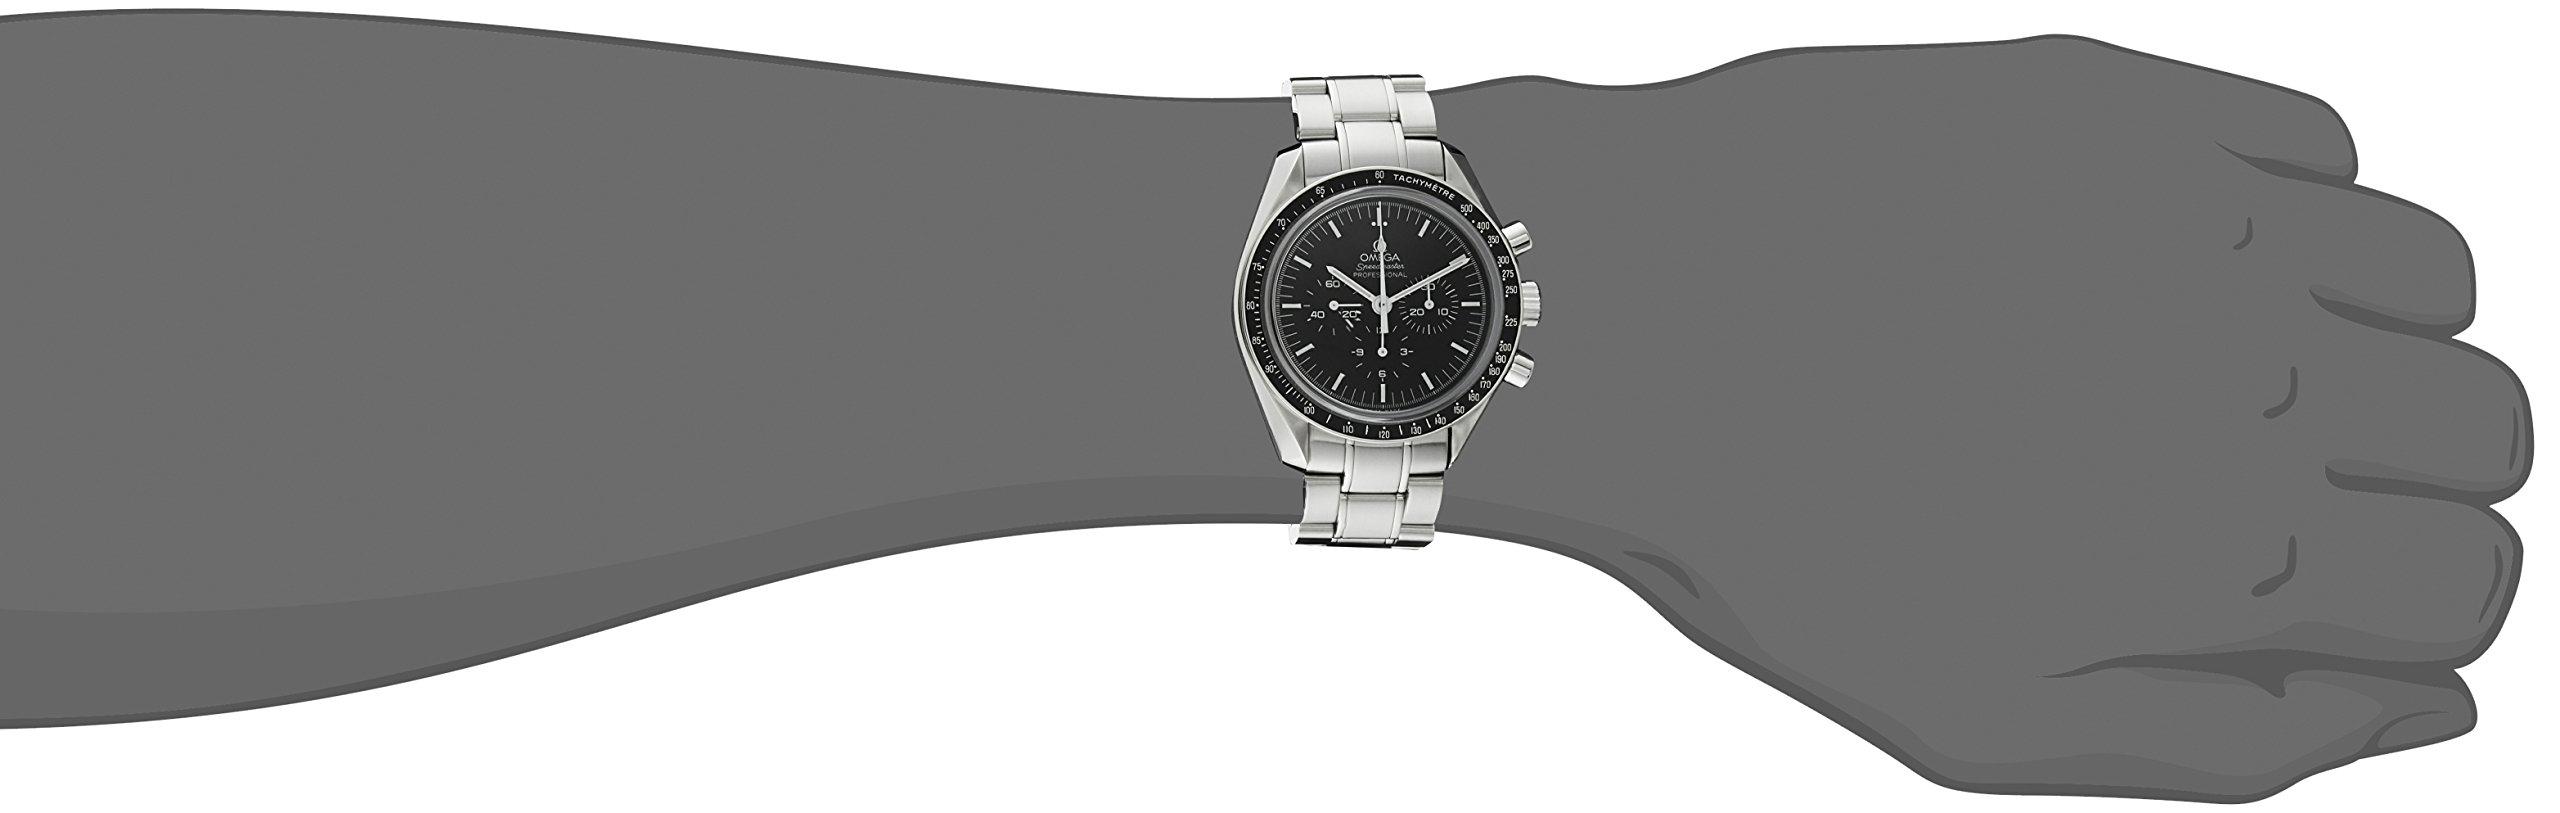 "Omega Speedmaster Professional ""Moonwatch"" - Reloj (Reloj de Pulsera, Acero Inoxidable, Acero Inoxidable, Acero Inoxidable, Acero Inoxidable, Hesalita) 3"